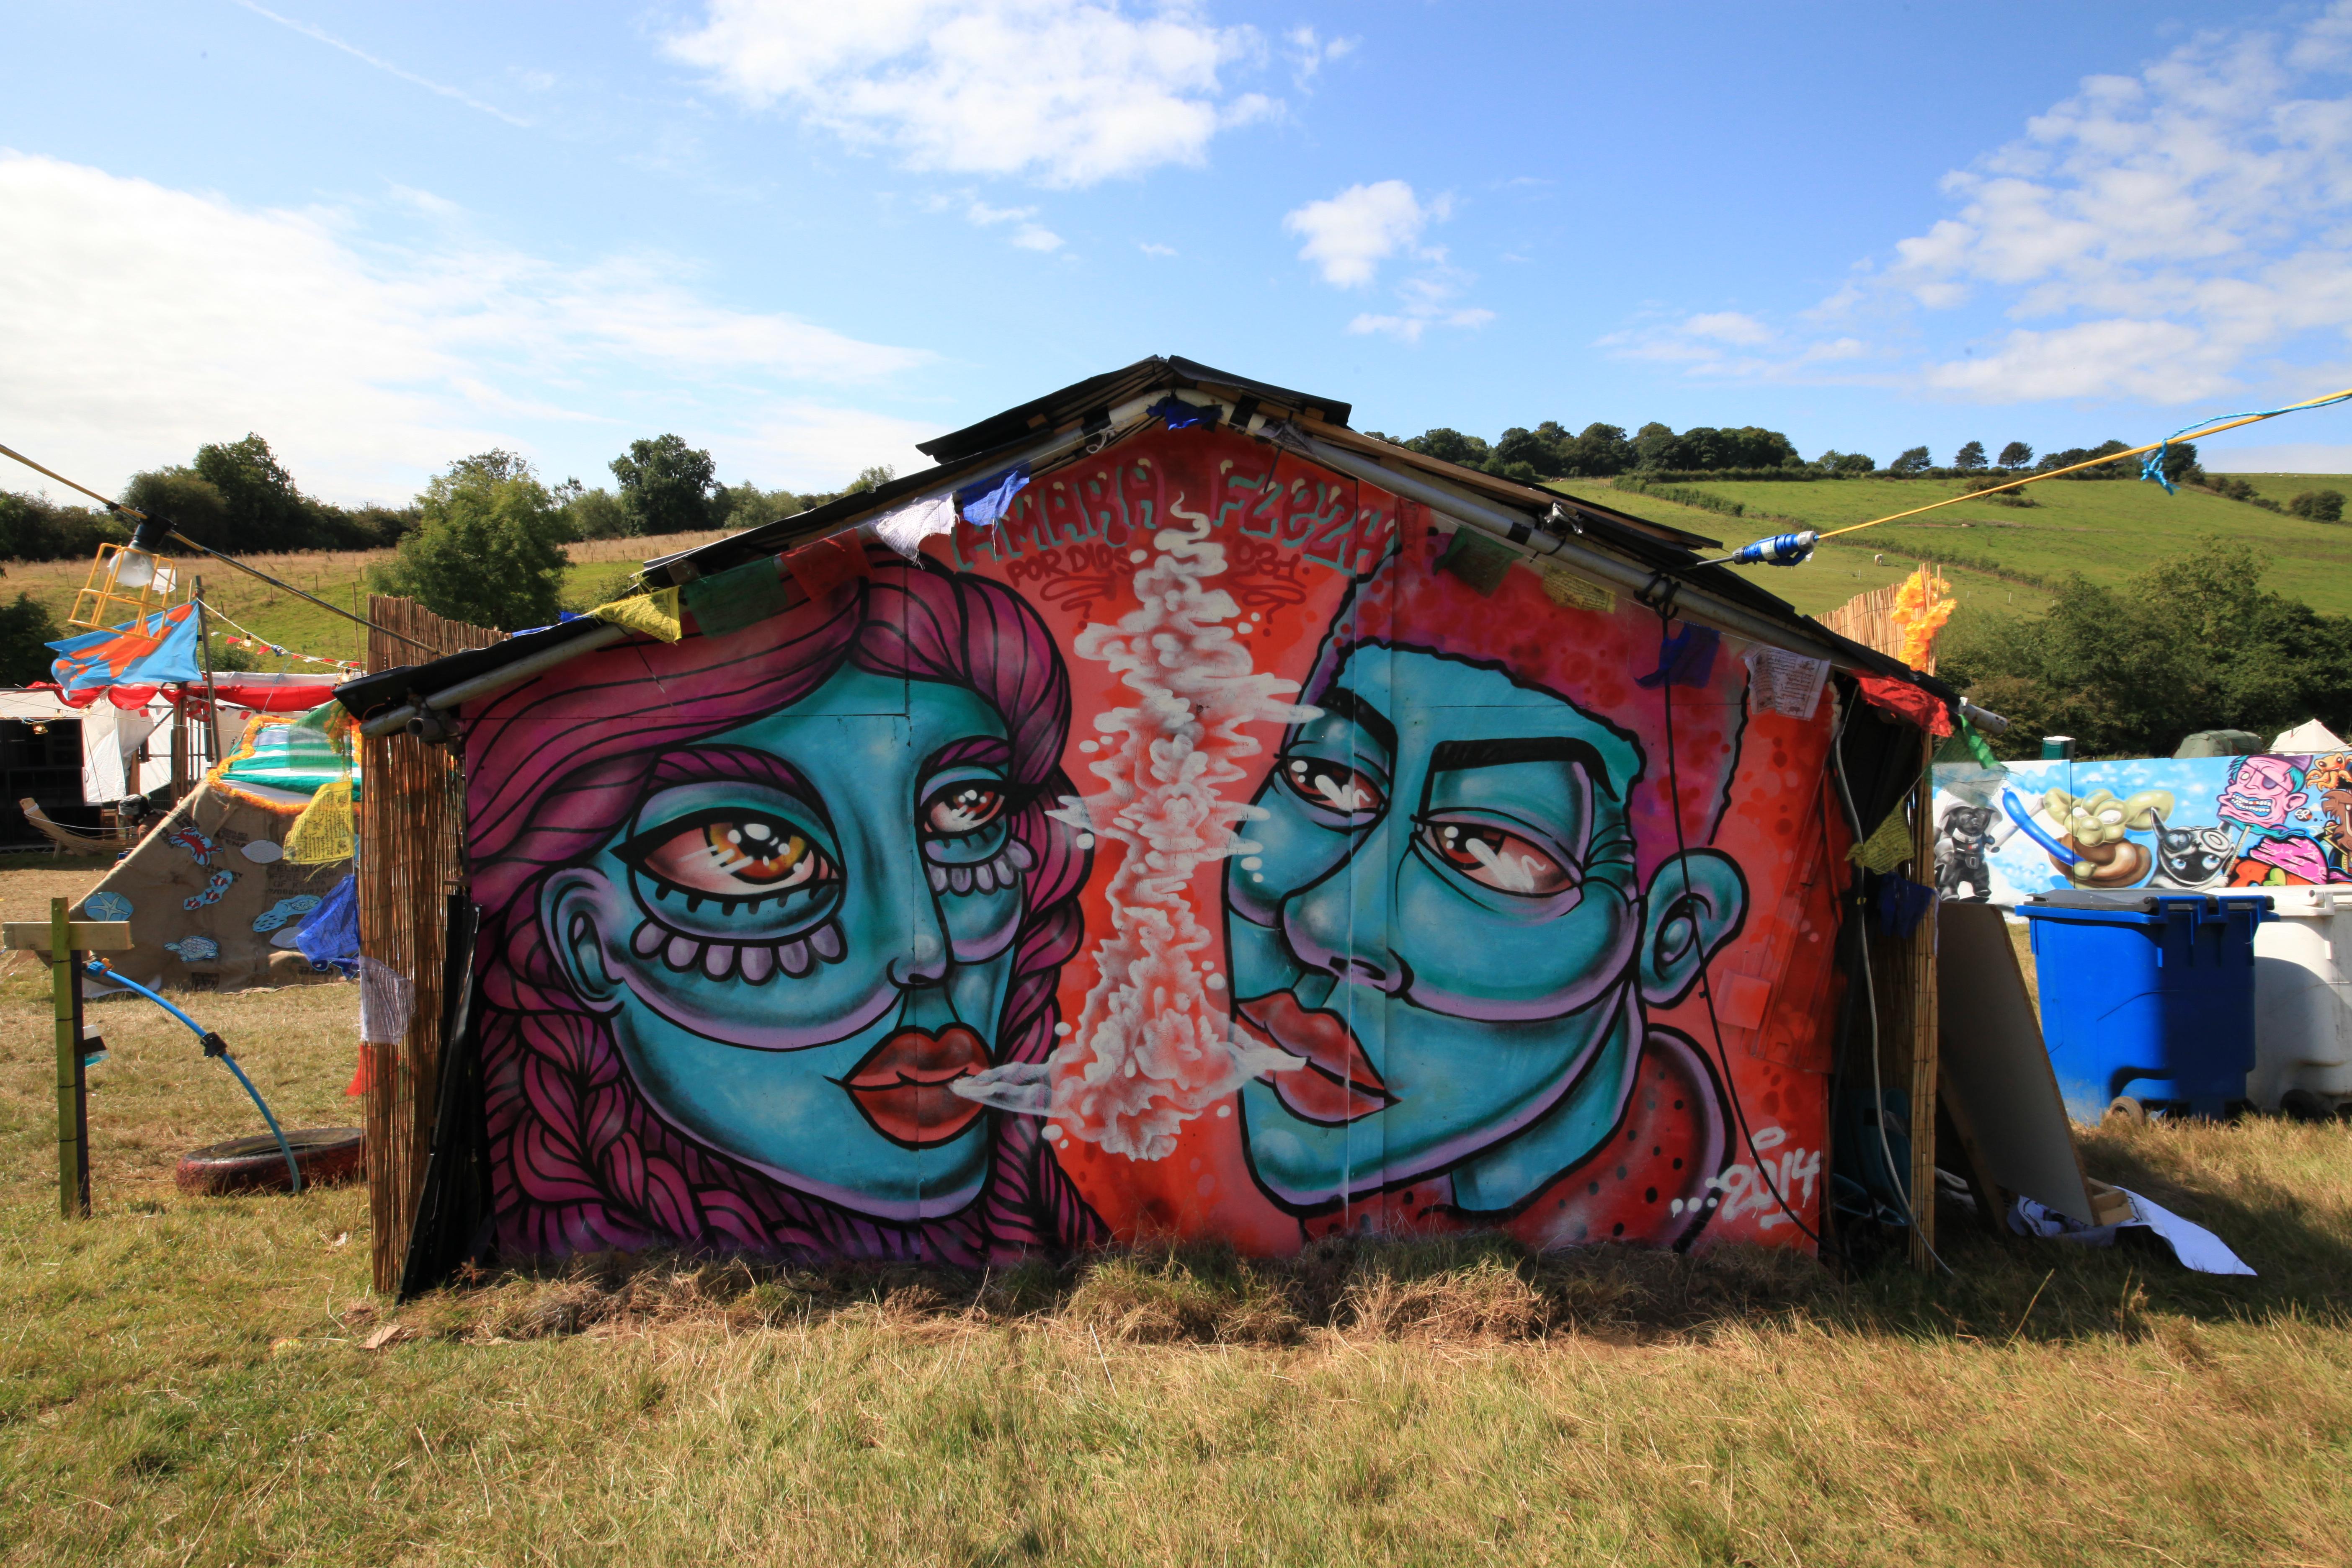 Hamswell festival